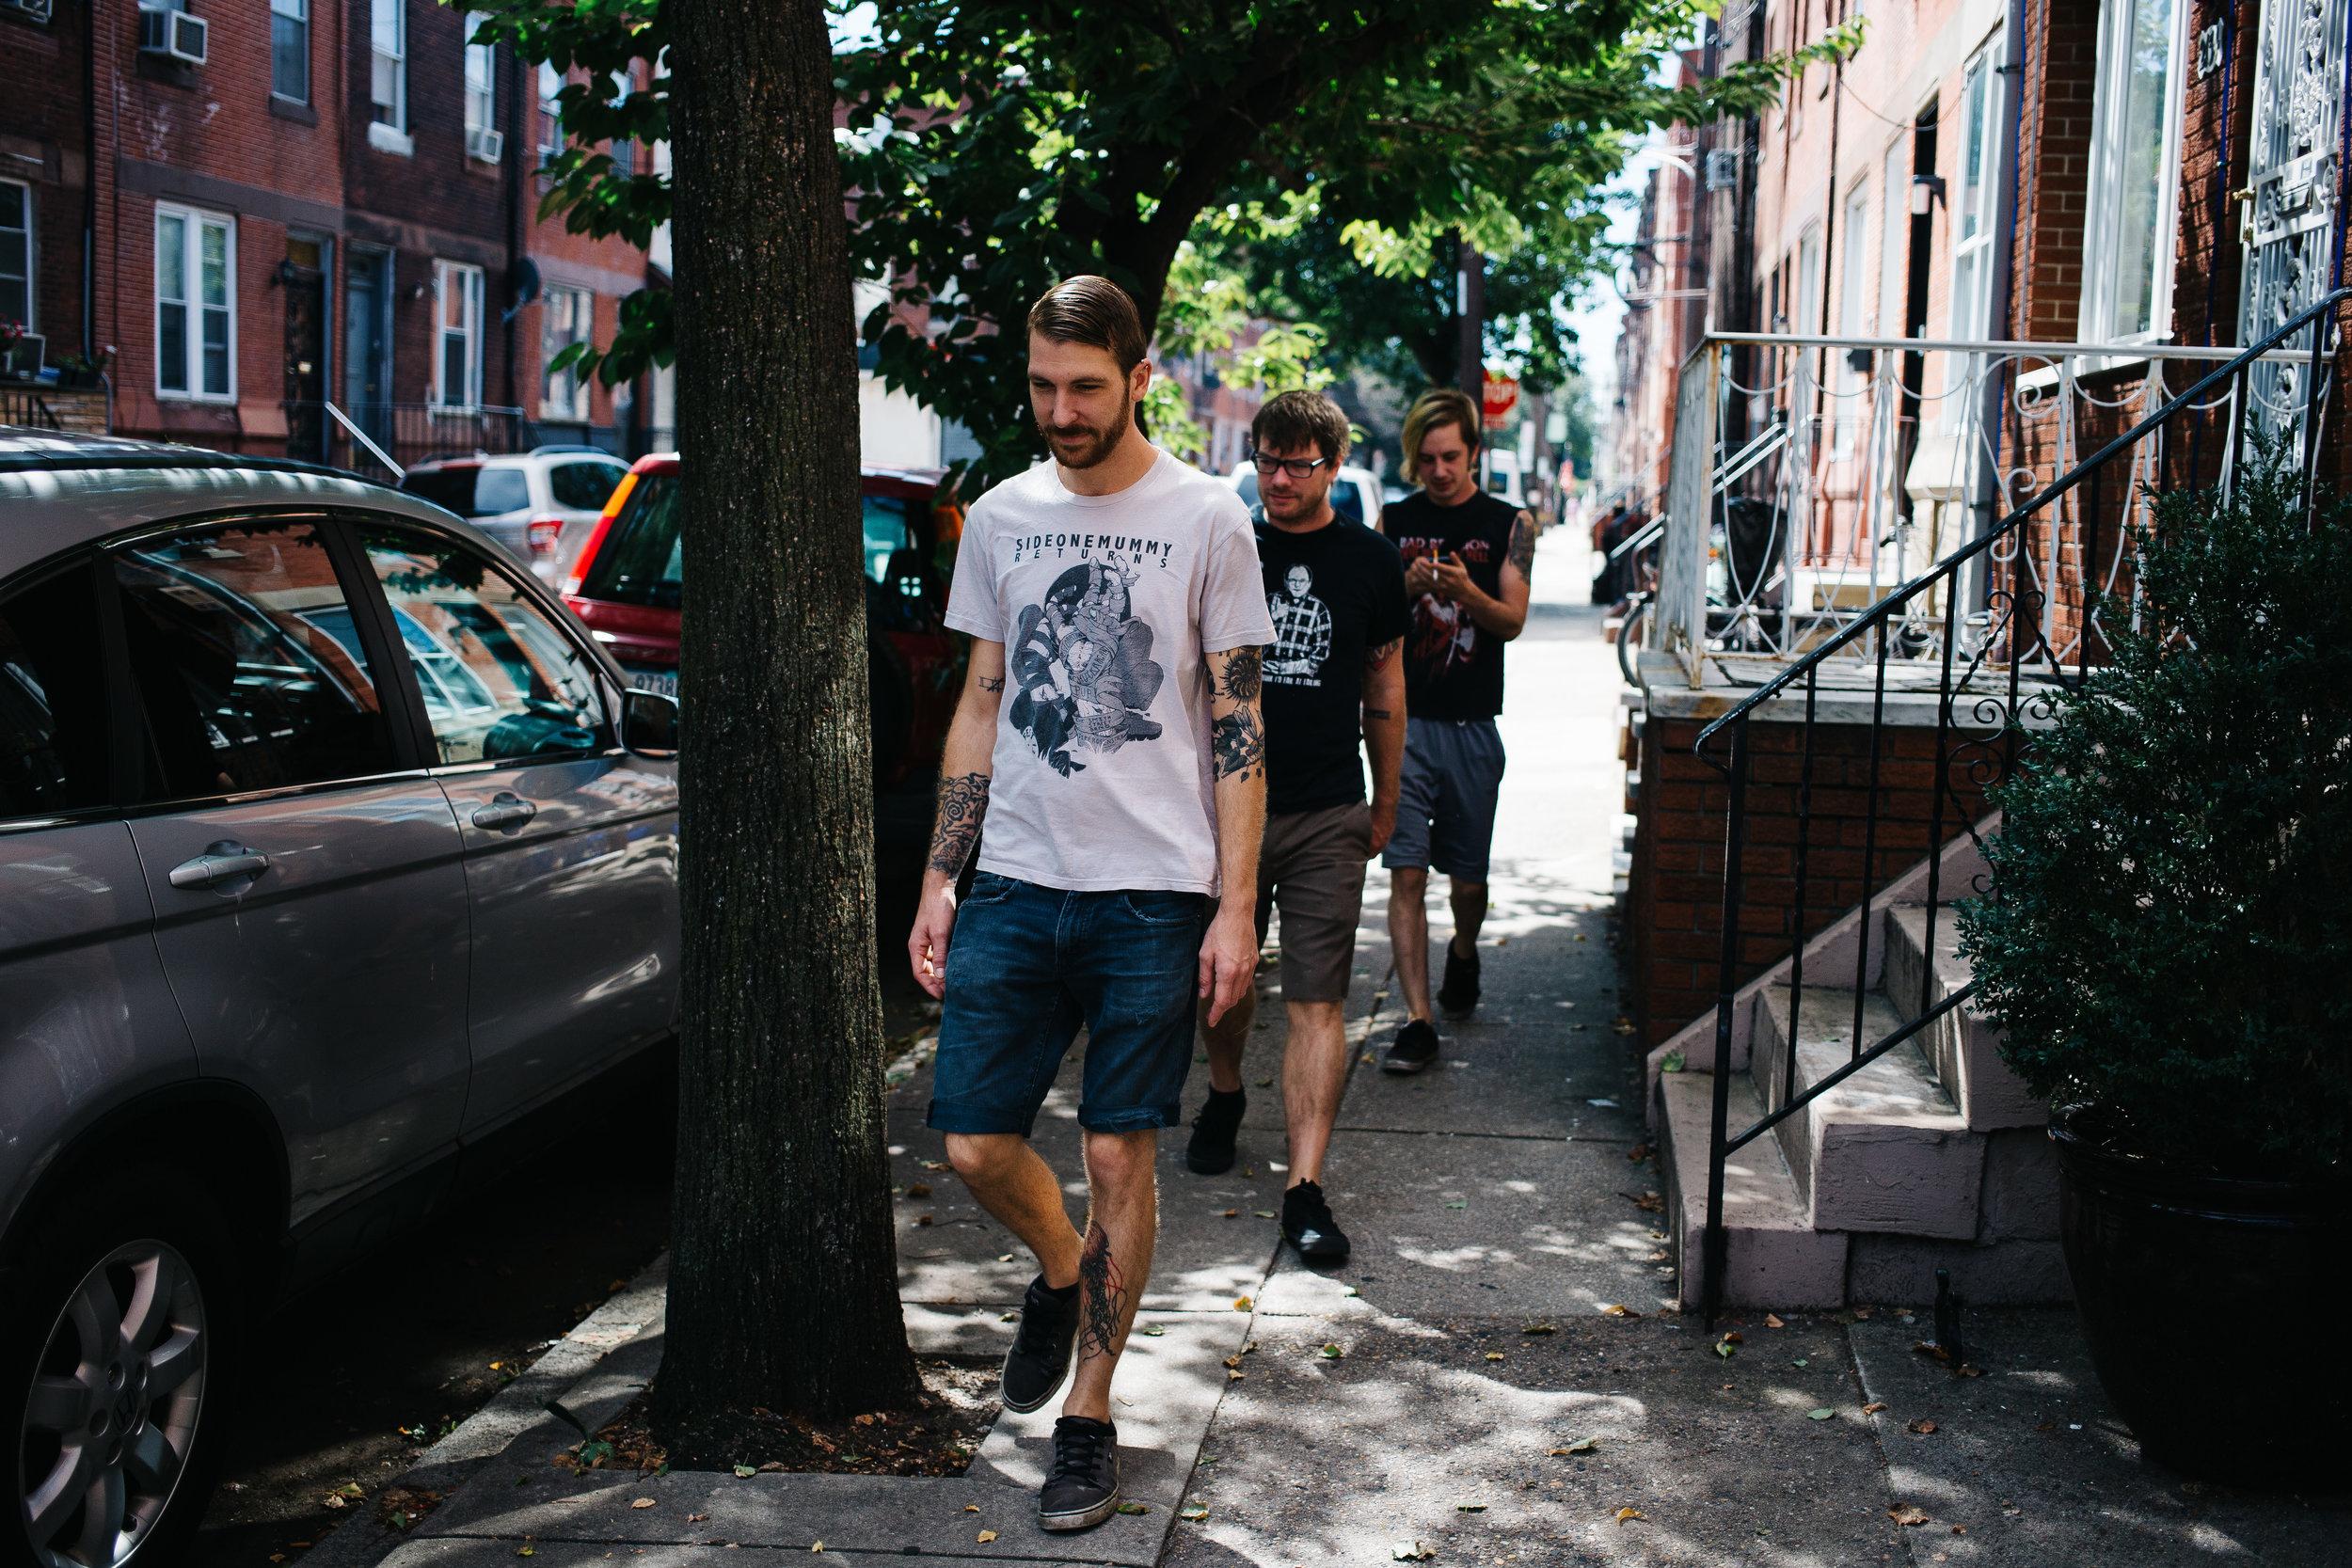 Steve, Ryan and Josh head to breakfast.